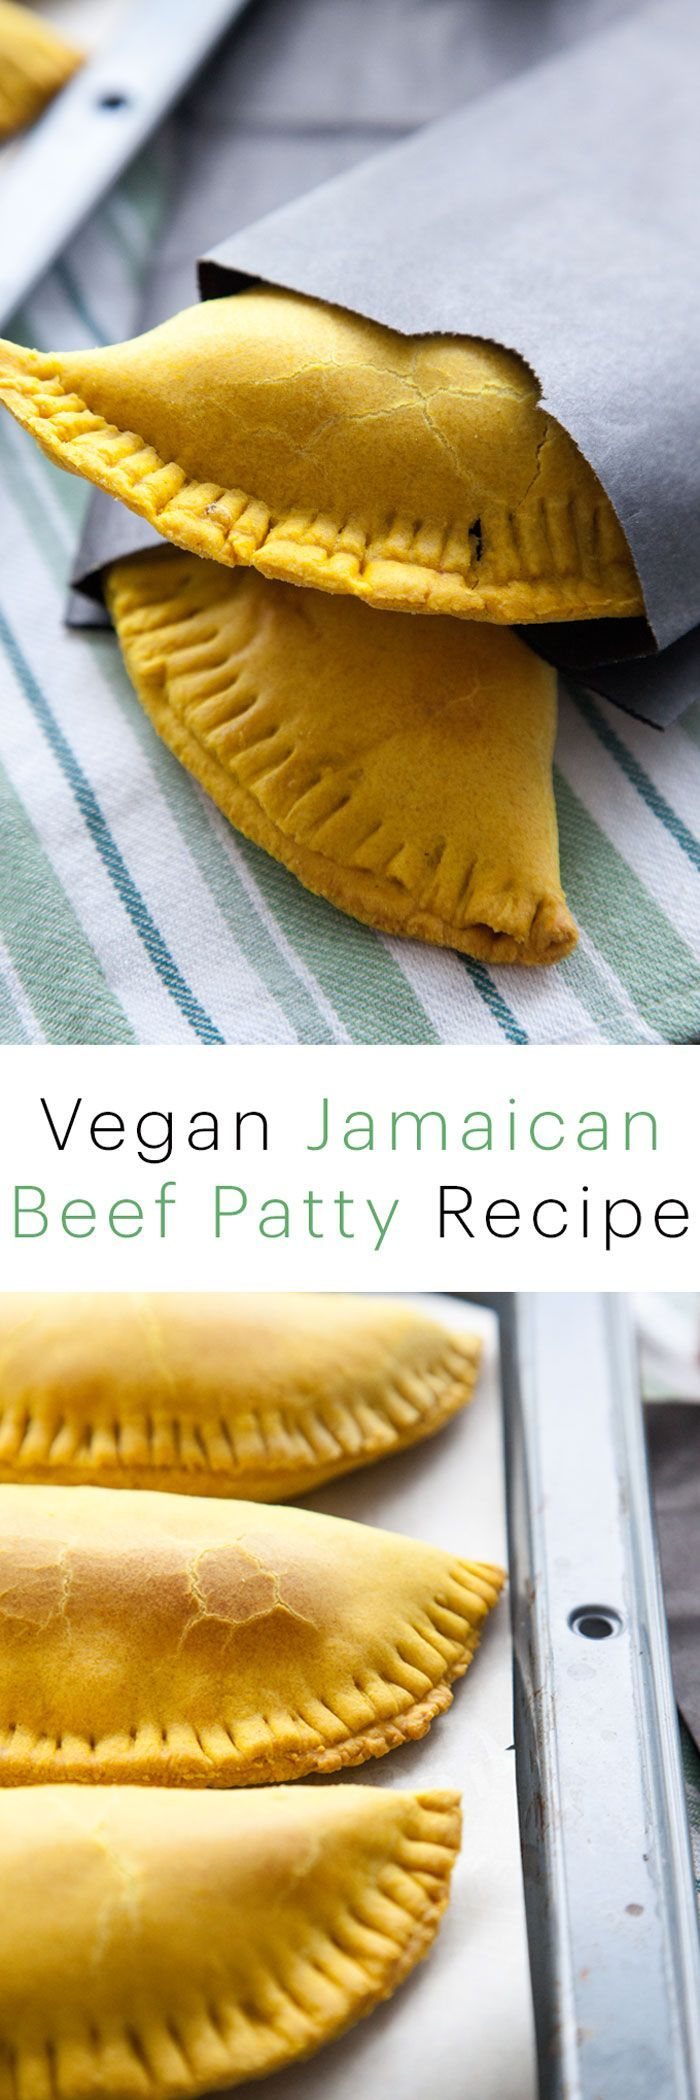 jamaican patties recipe  vegan  recipe  vegan dishes vegan recipes food recipes